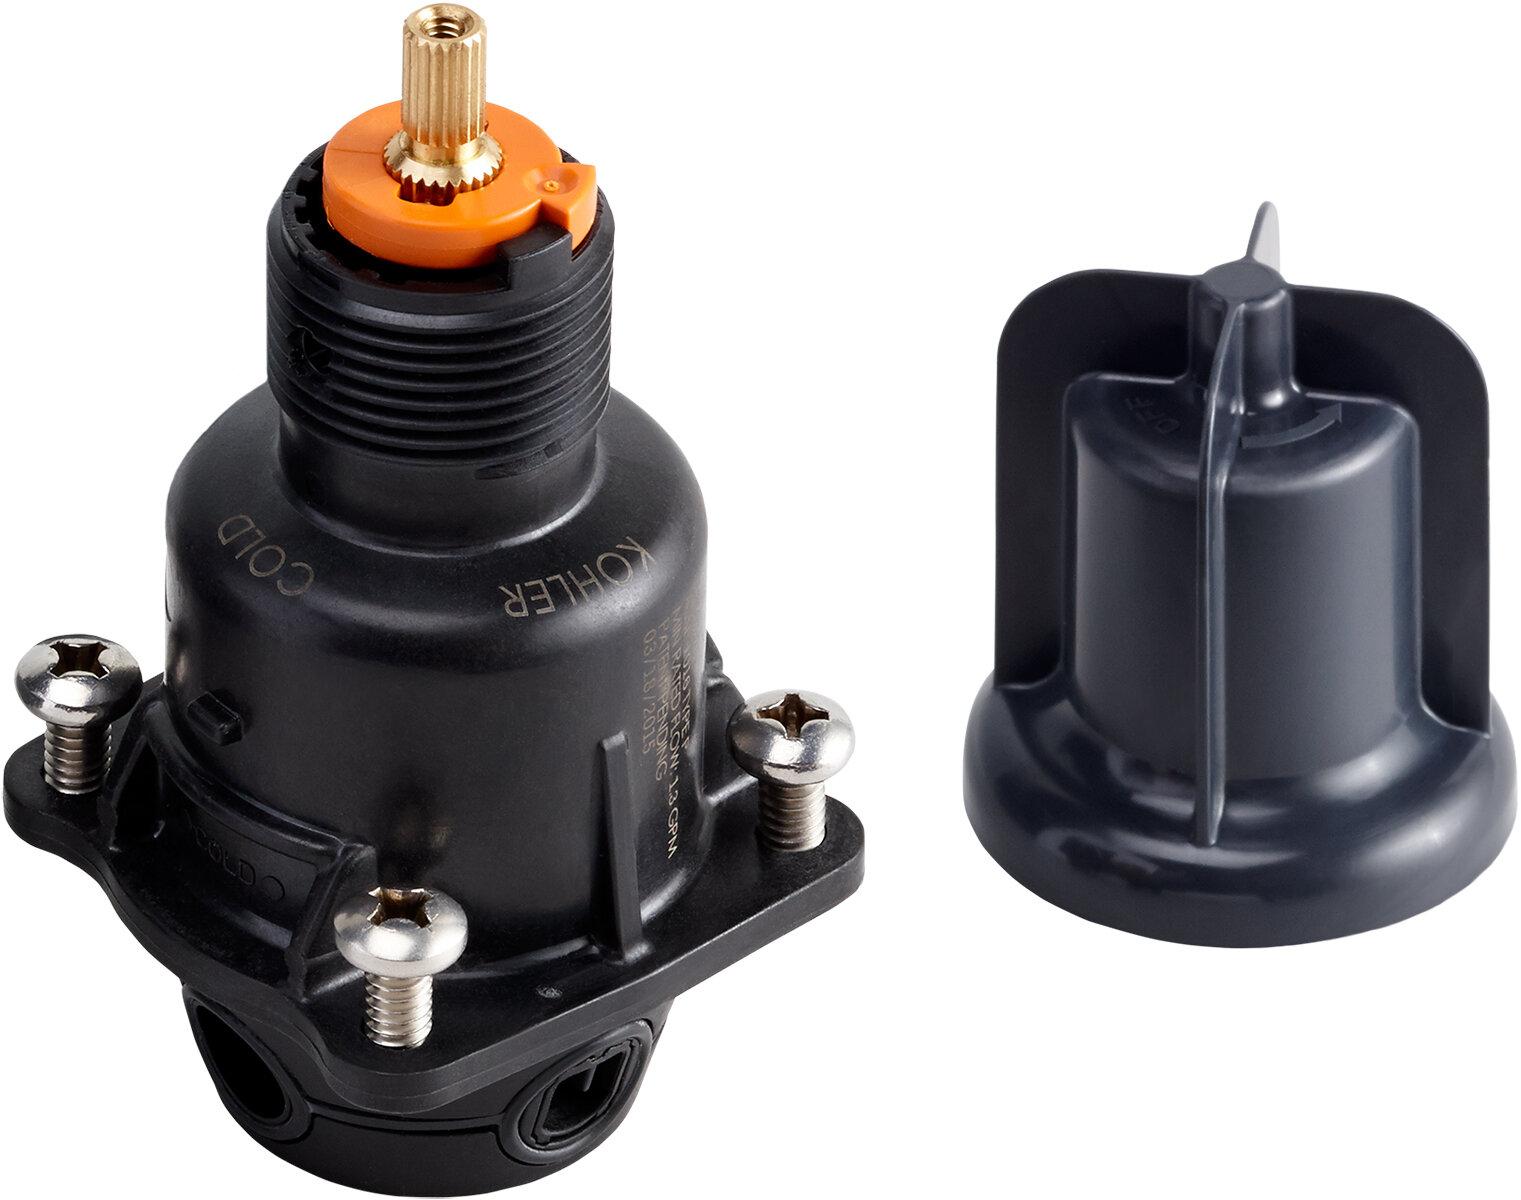 Kohler Rite Temp Pressure Balance Cartridge Project Pack